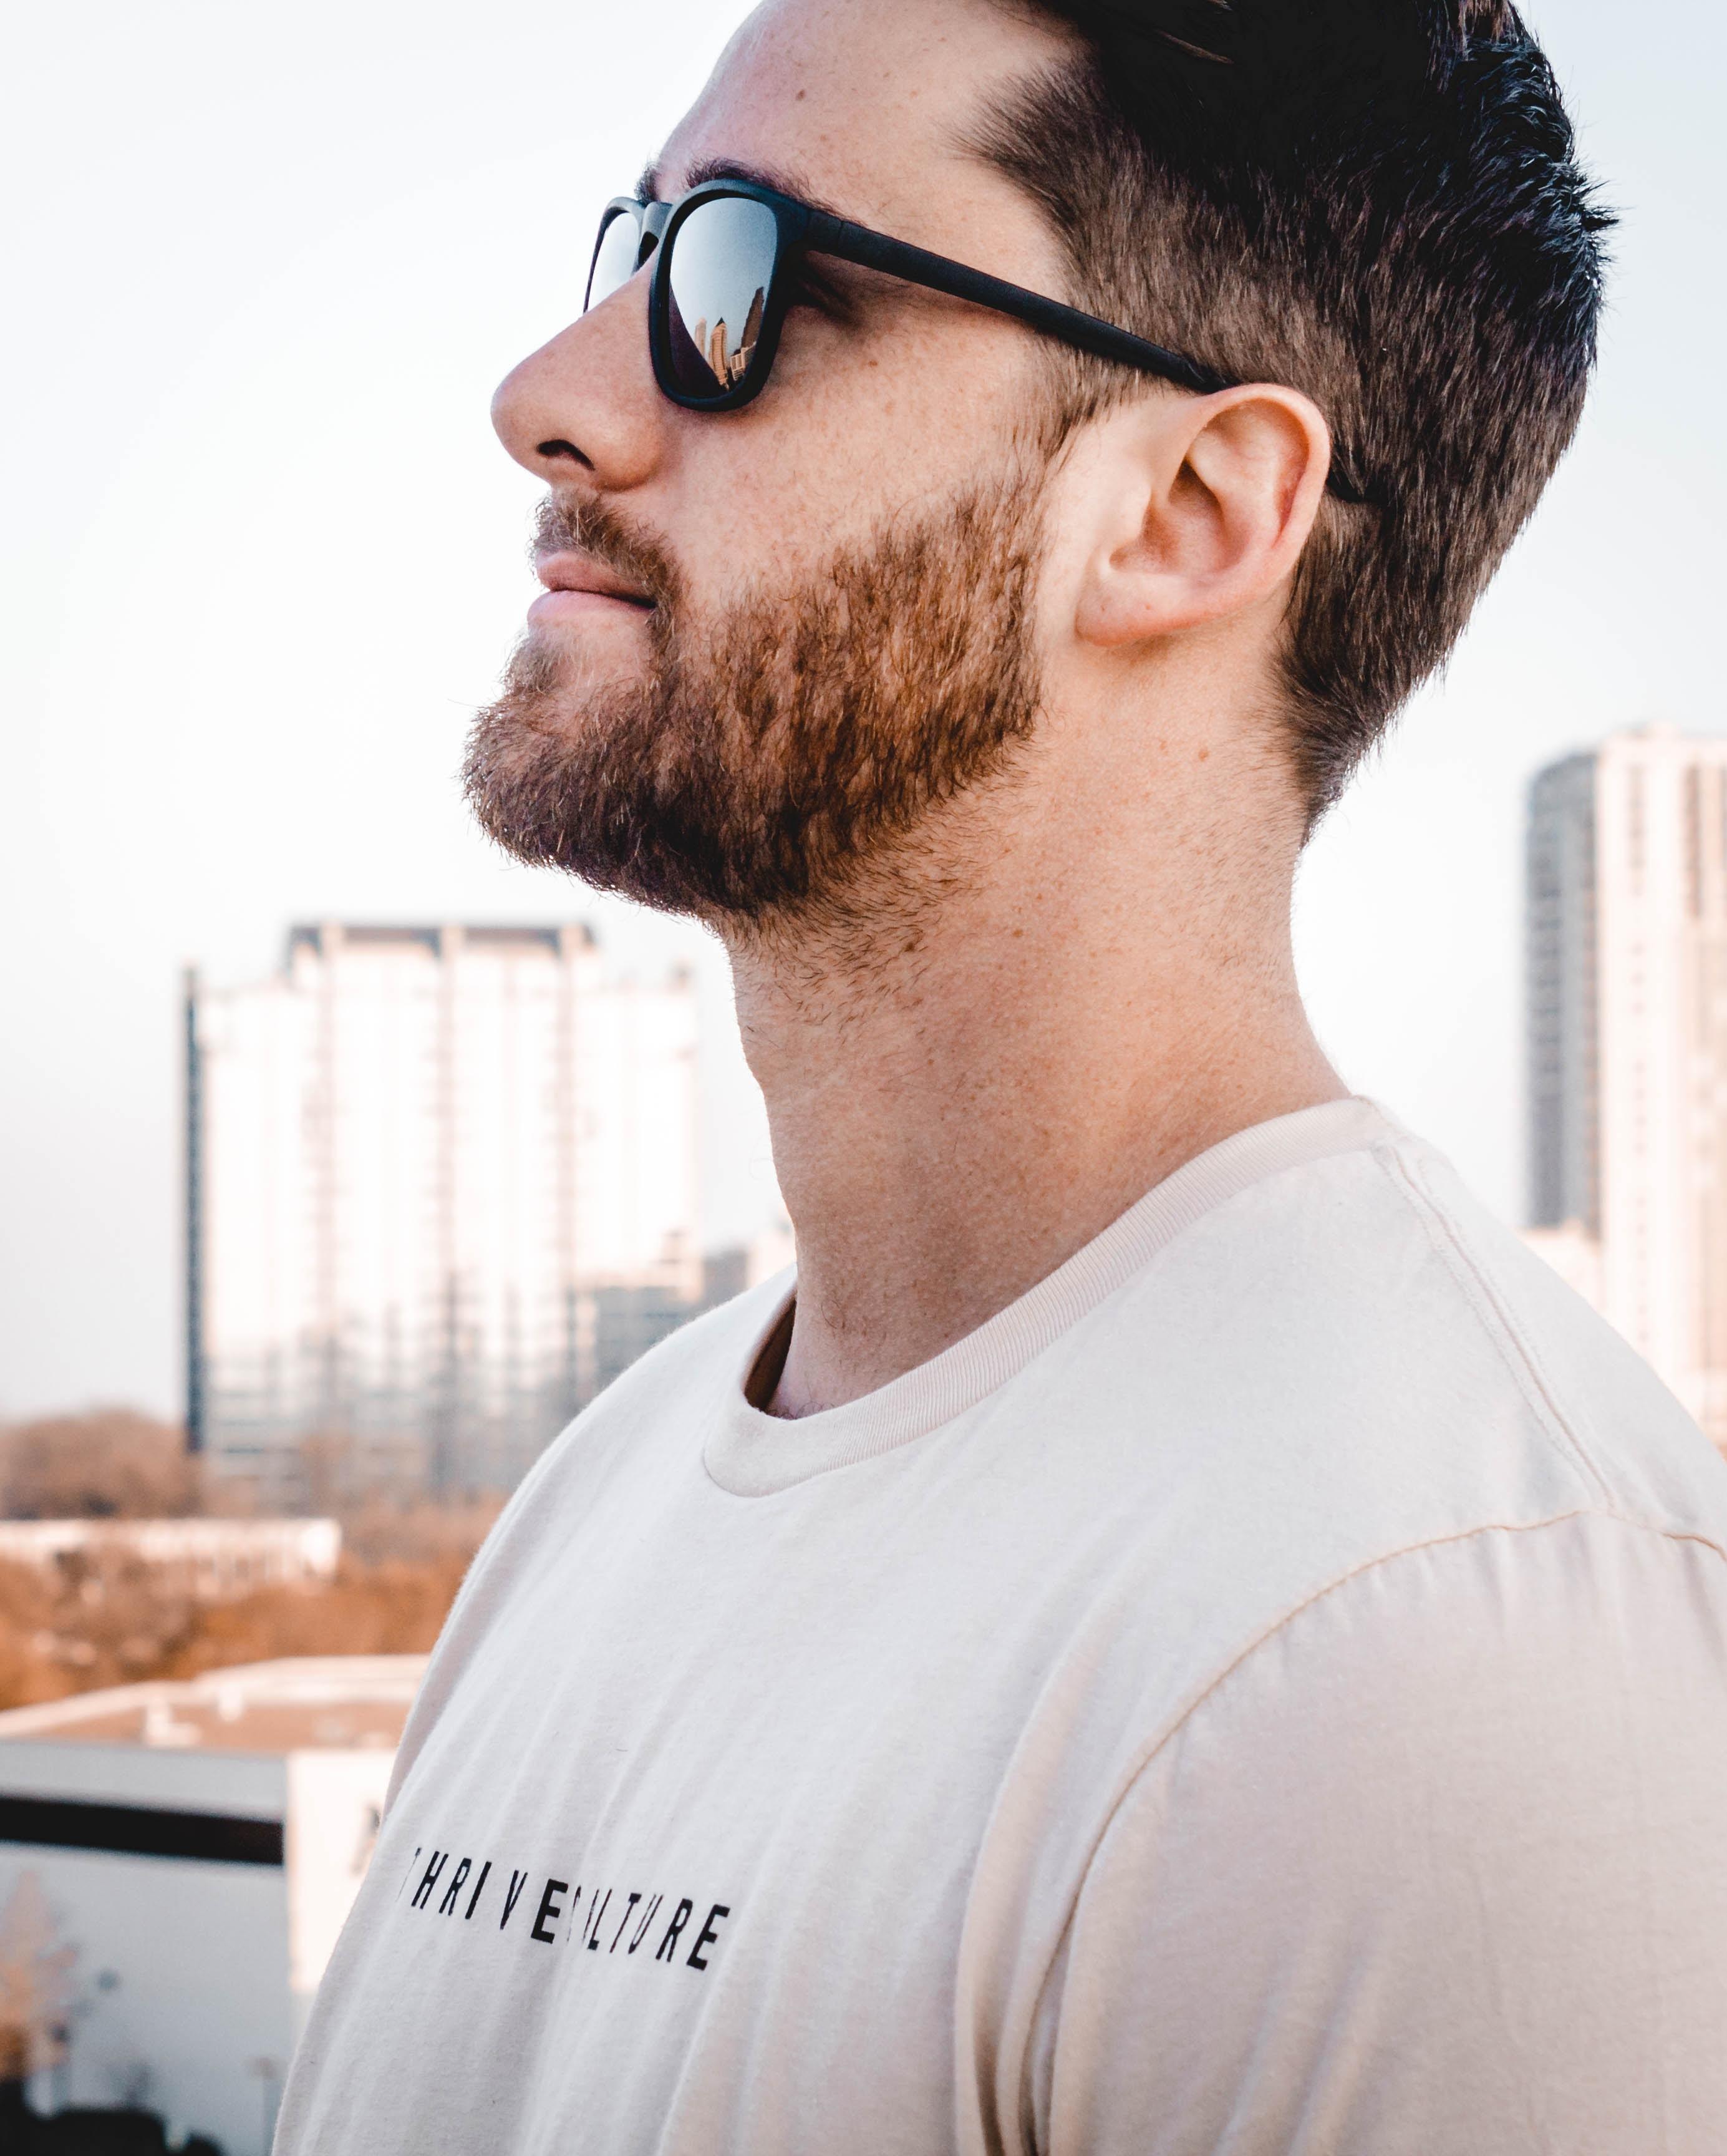 Hot guy pic